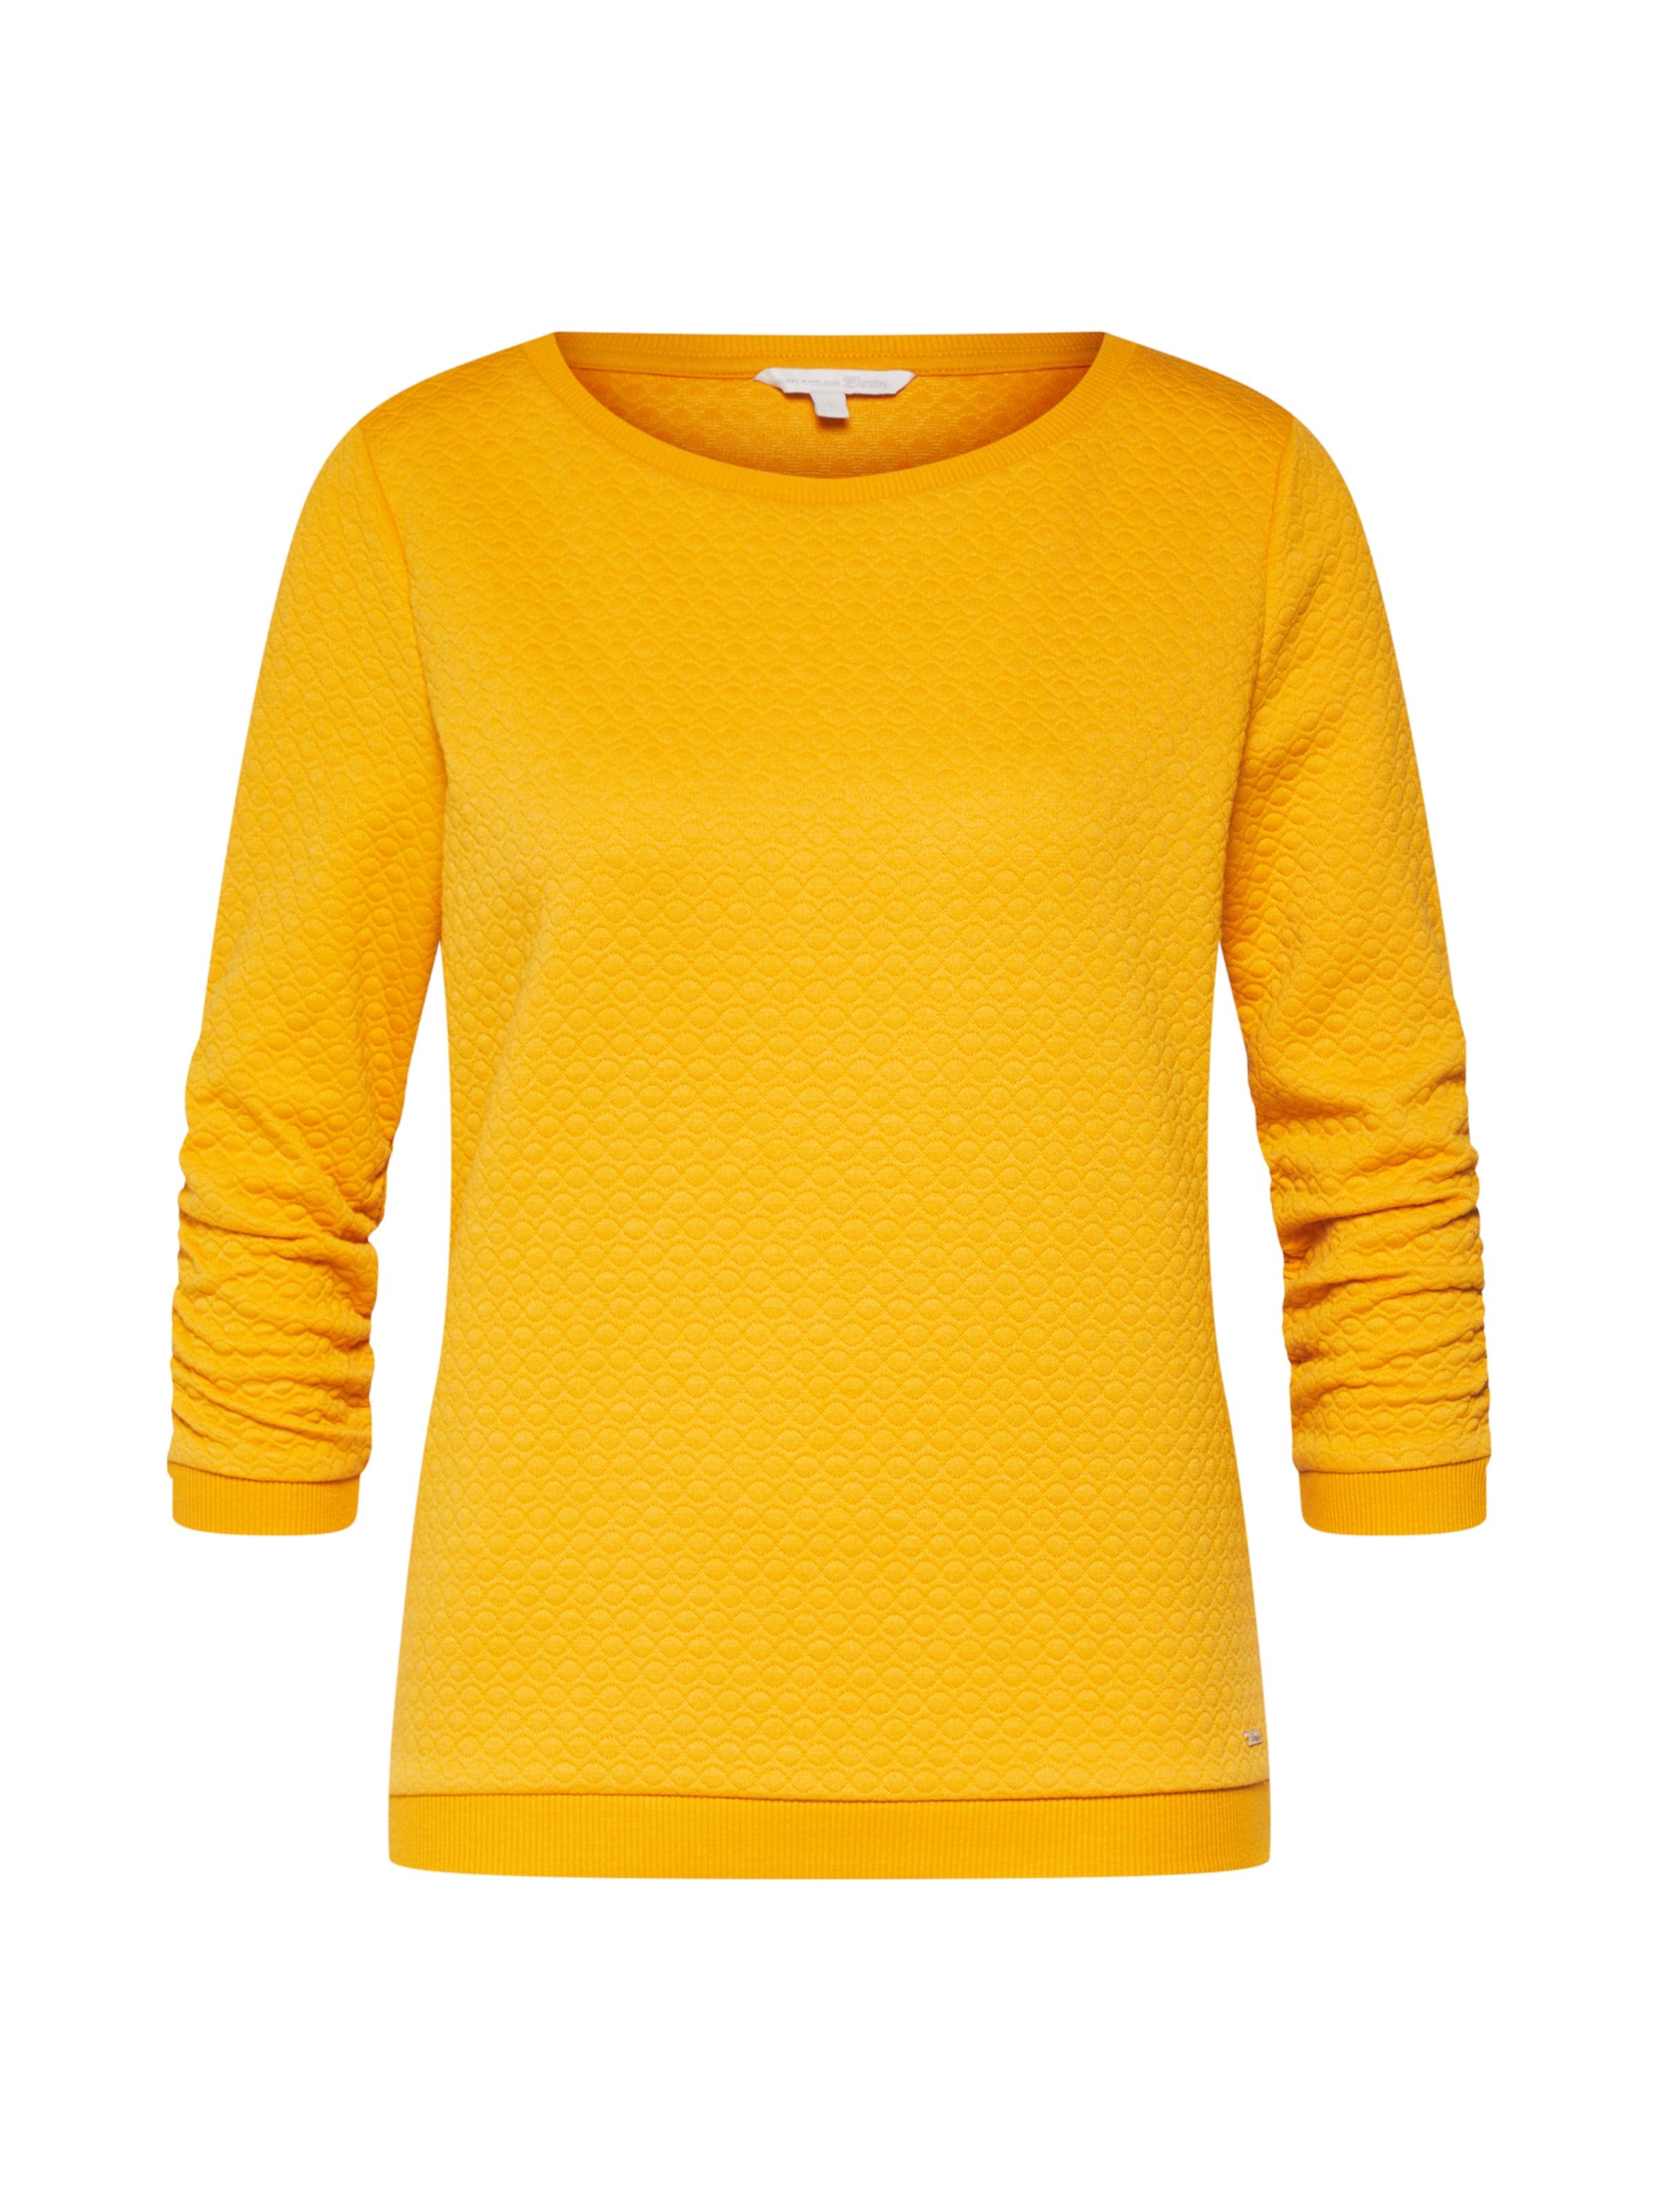 shirt Tom En Sweat Moutarde Tailor Denim pSVqGLMUz